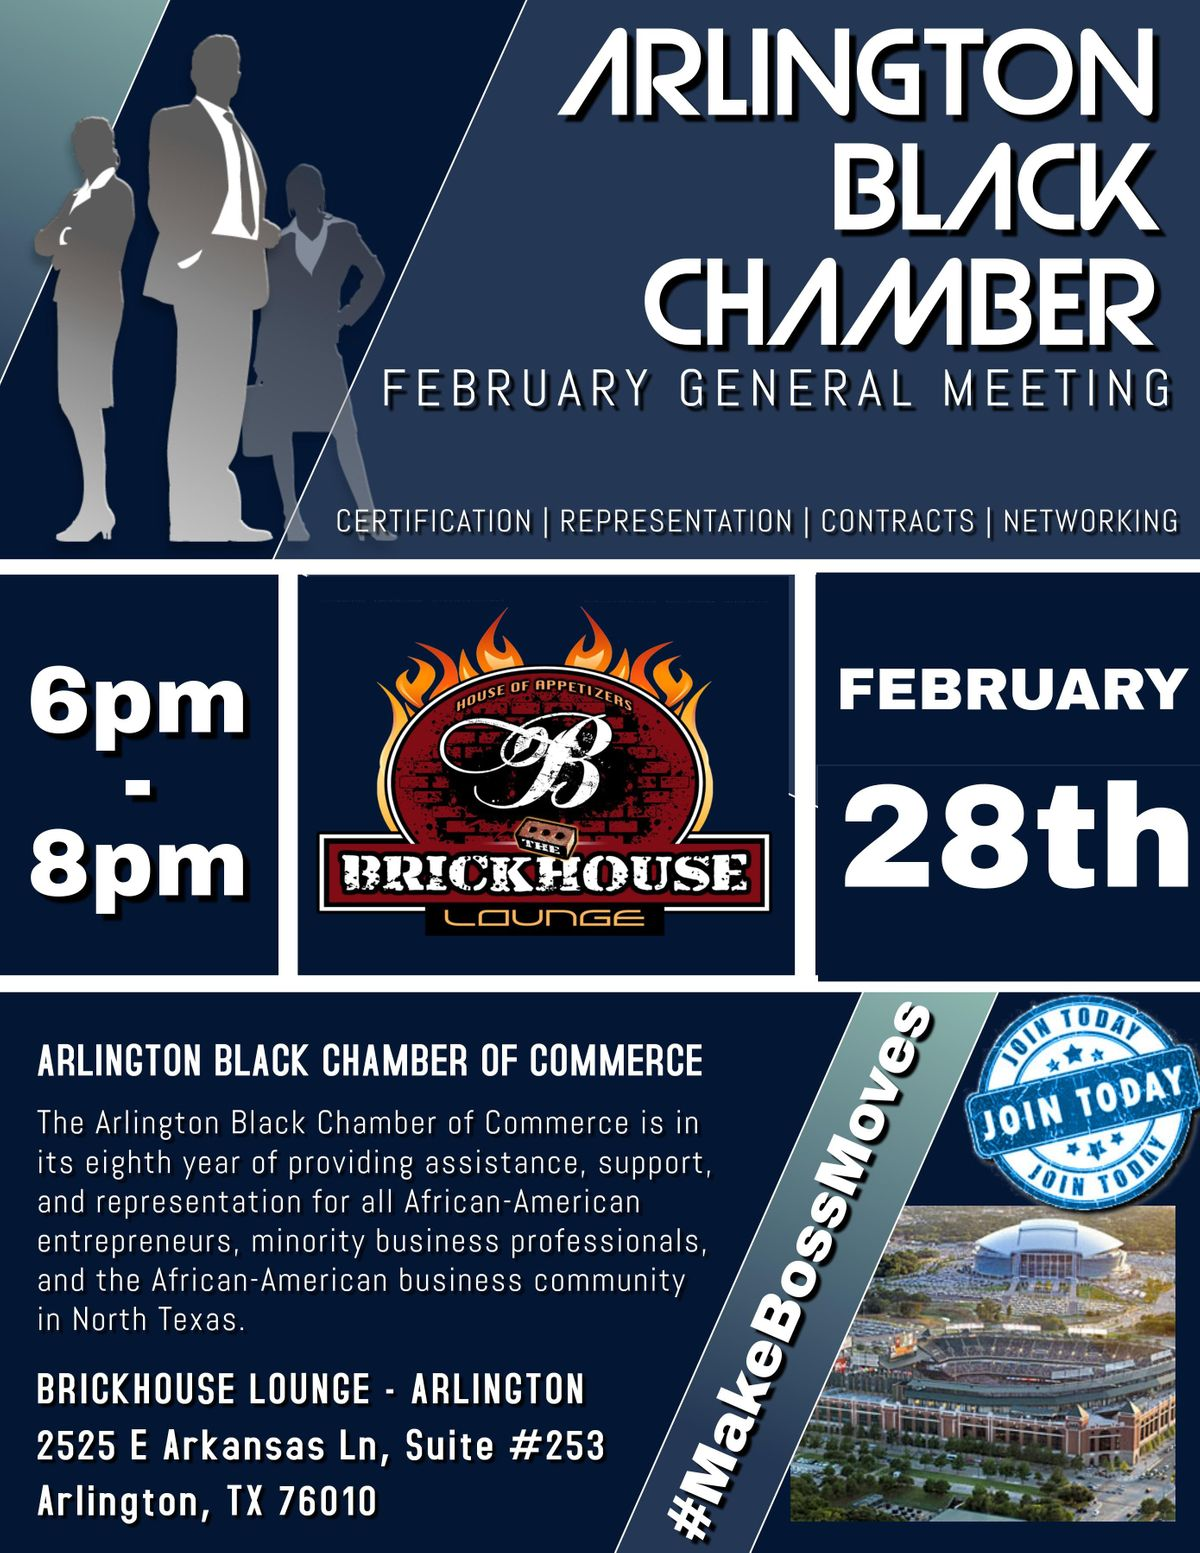 Arlington Black Chamber Febuary General Meeting